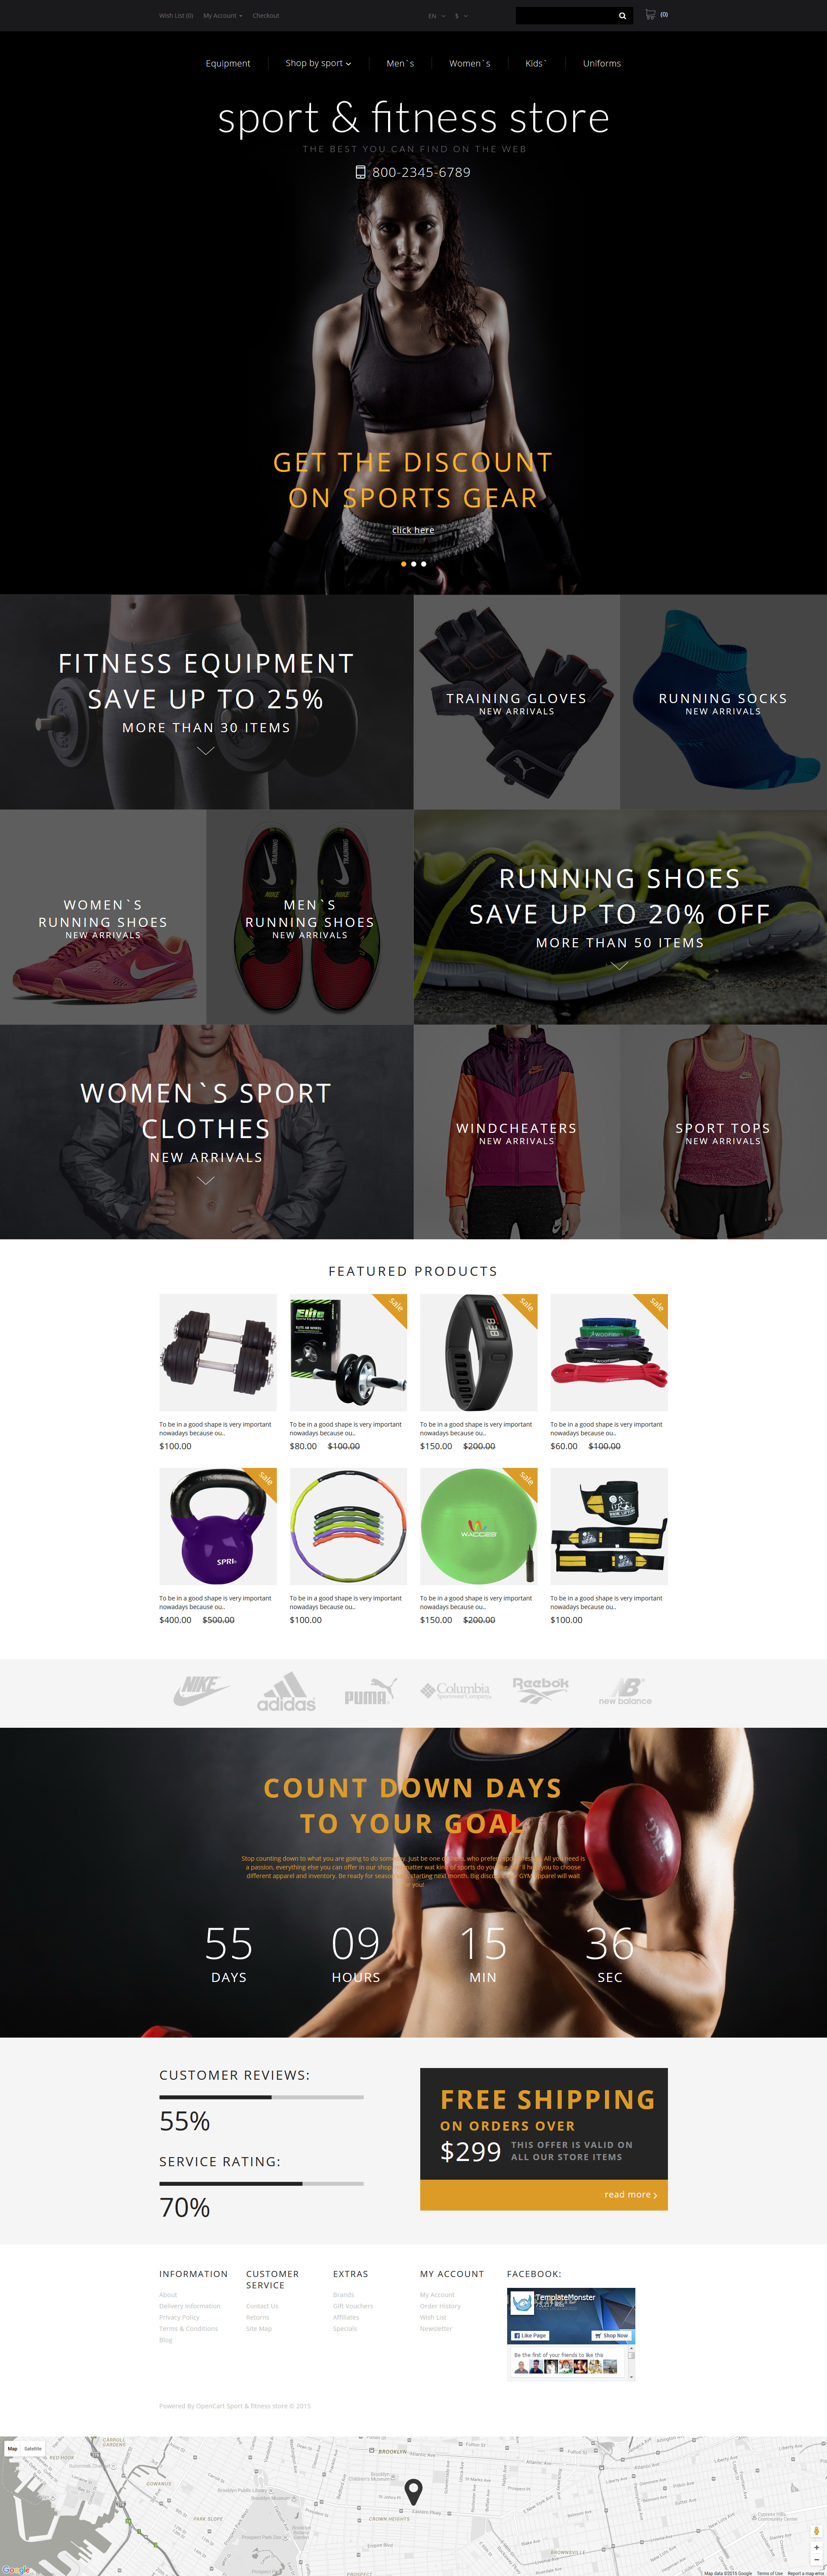 Fitness Training OpenCart Template - screenshot